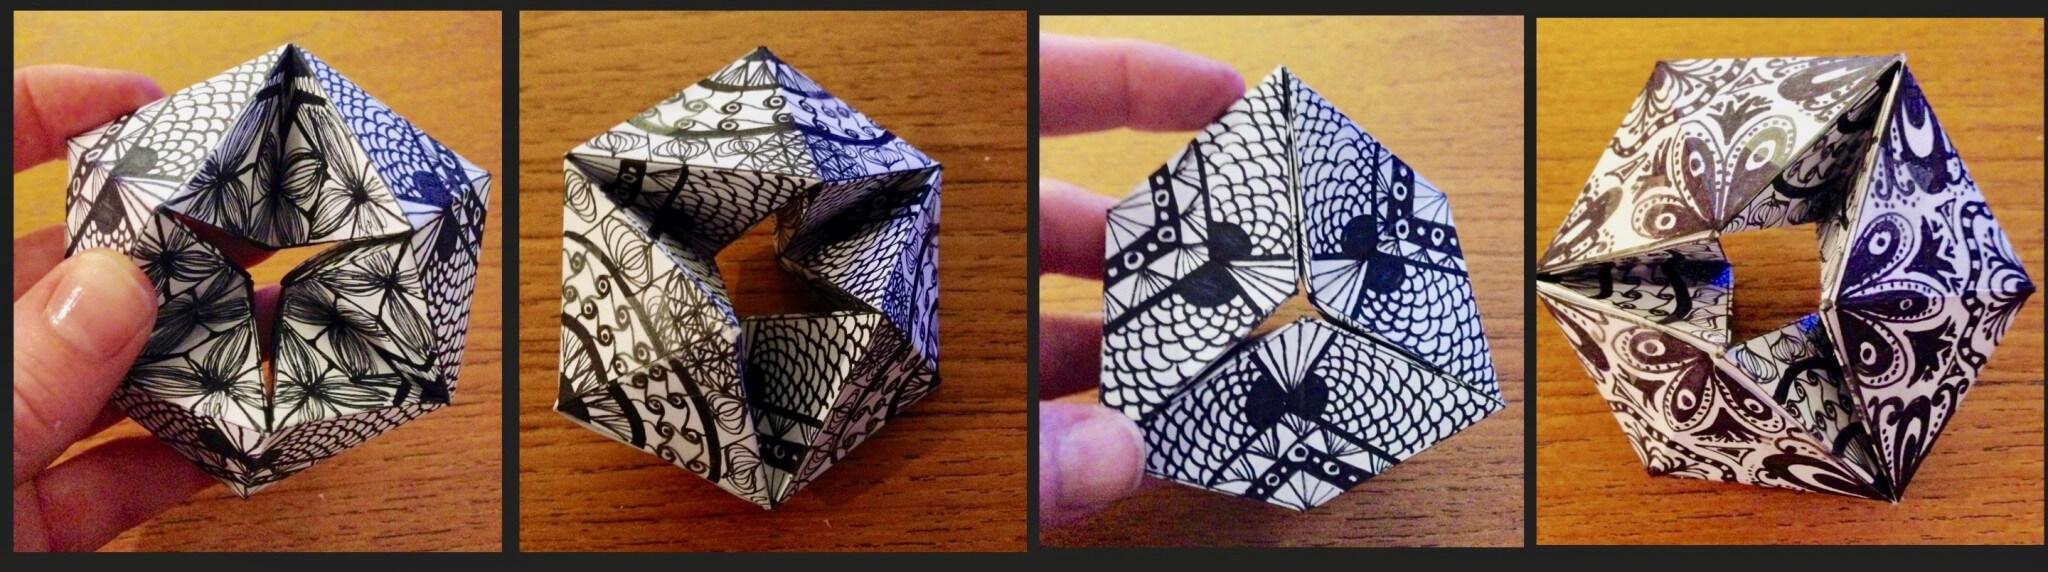 Kinetic Mathematical Sculptures